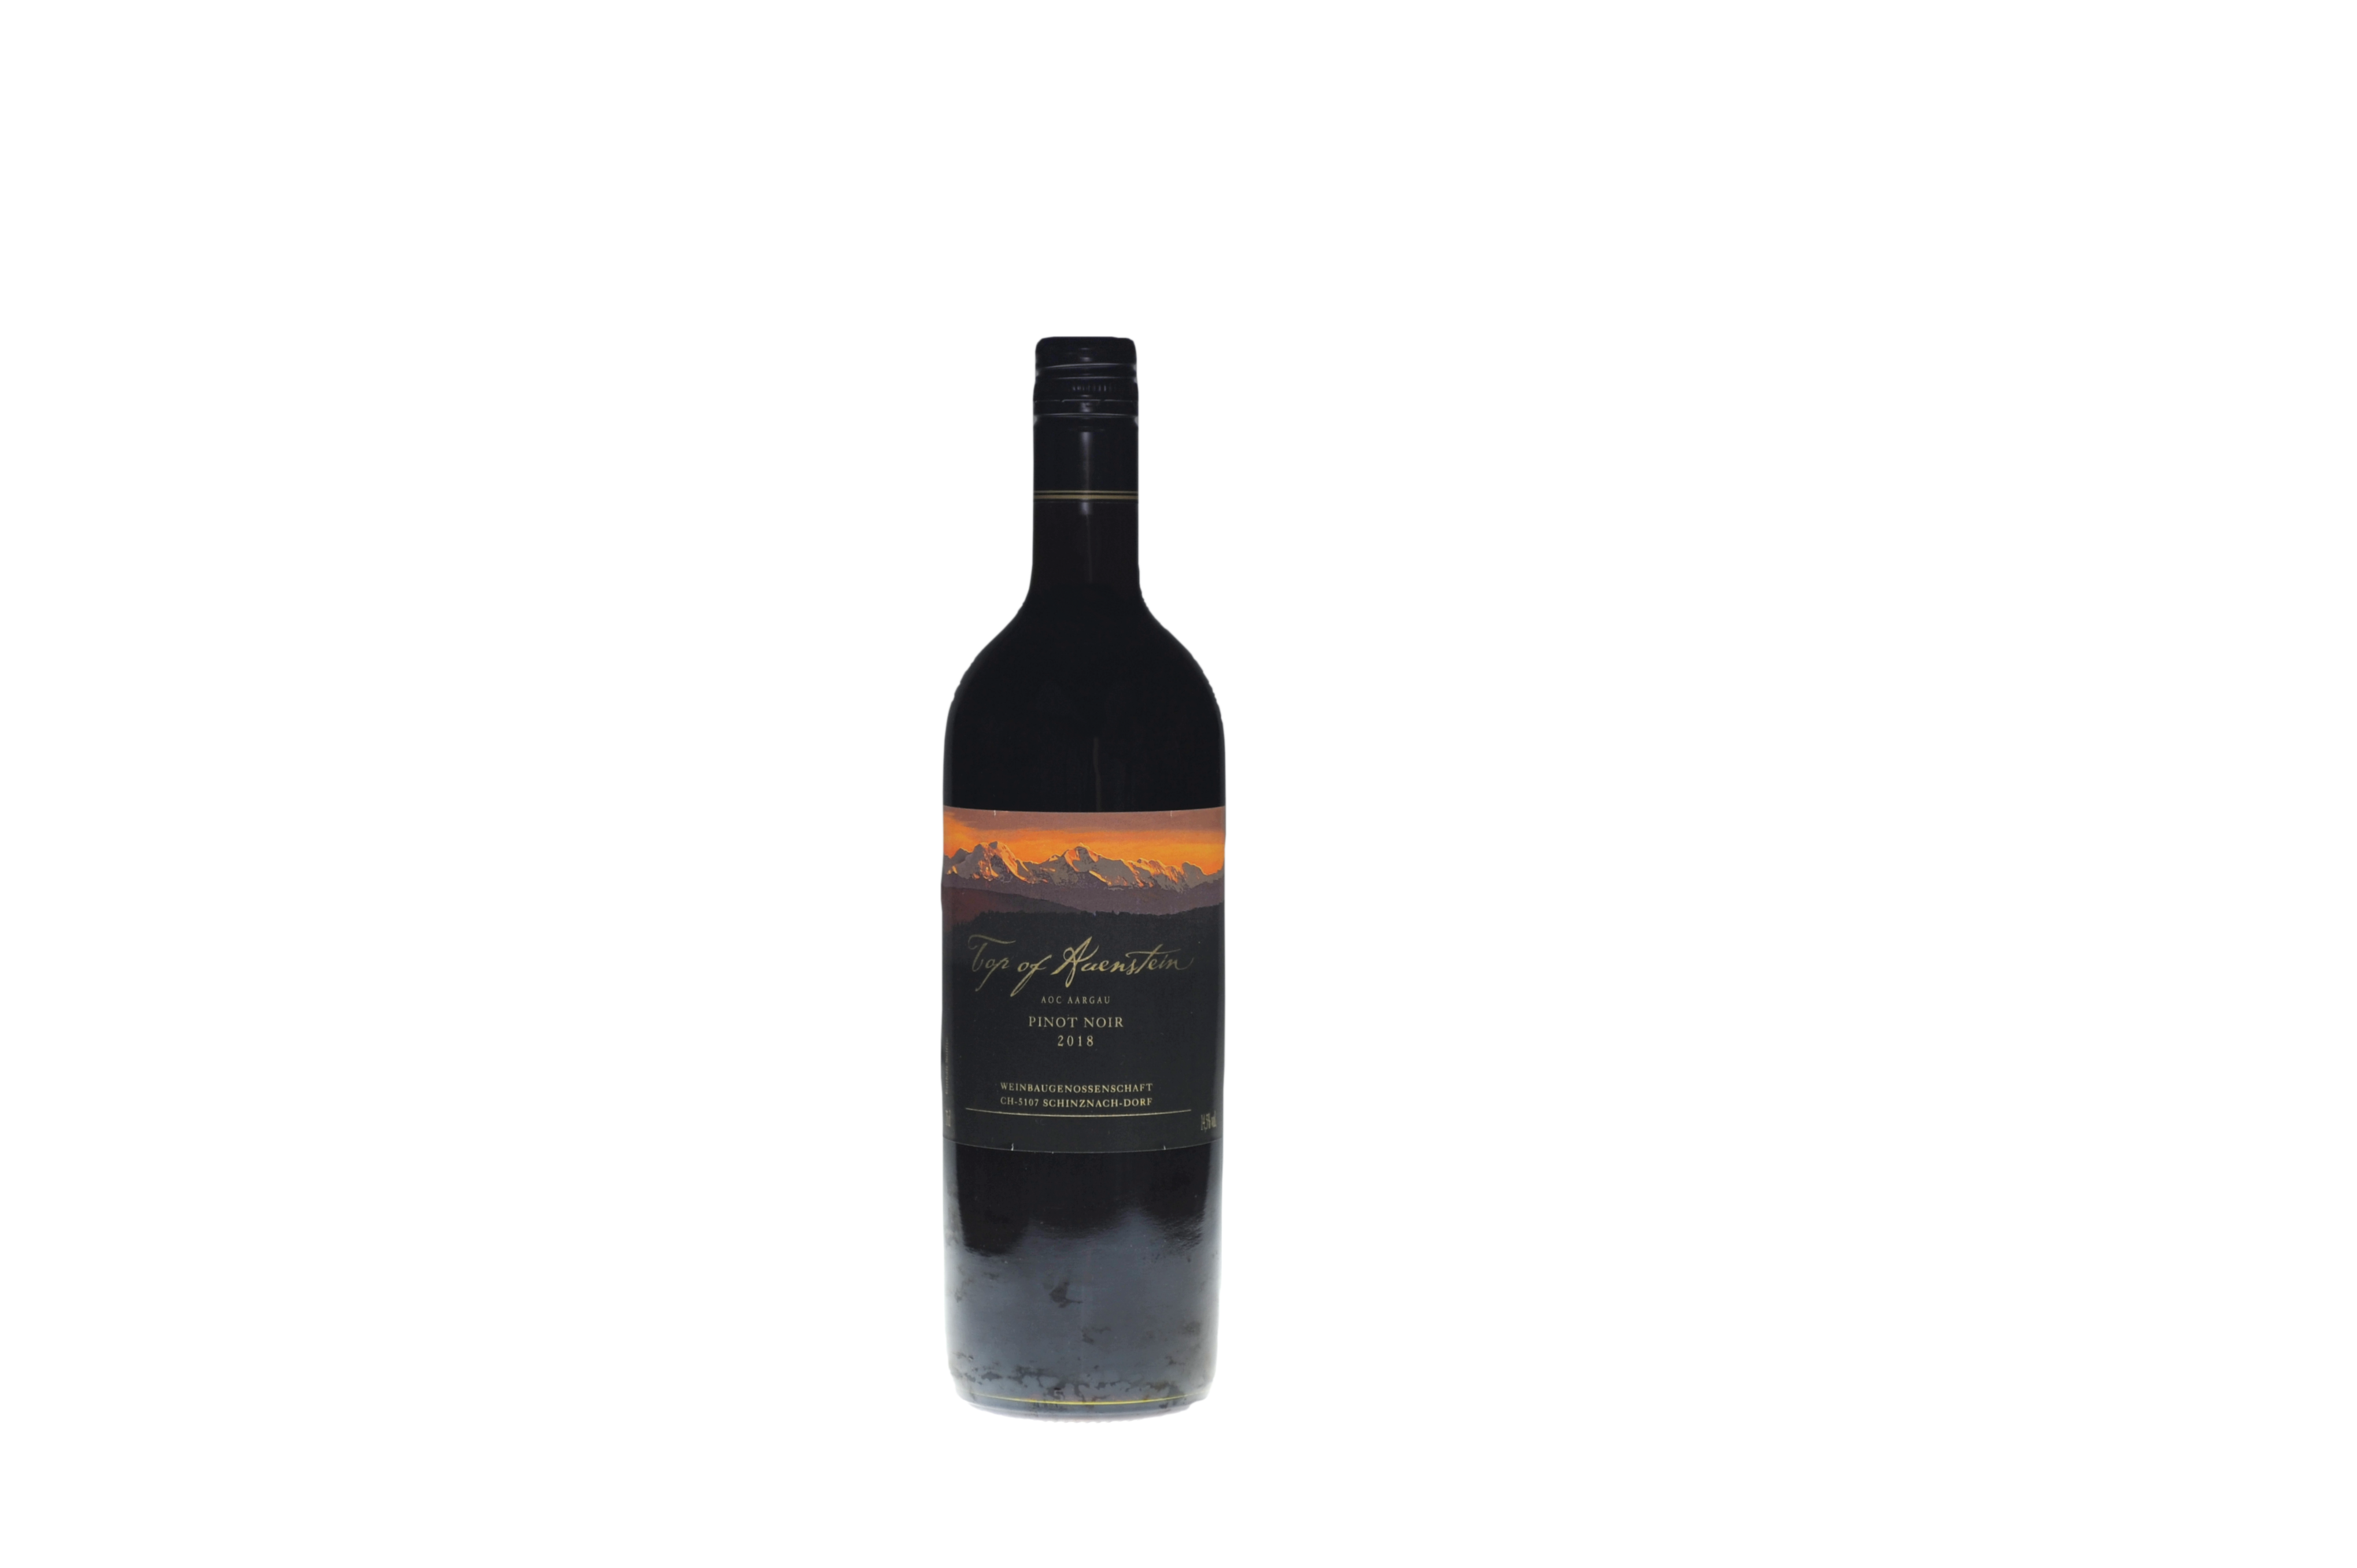 Top of Auenstein Pinot Noir Winzer-Wy